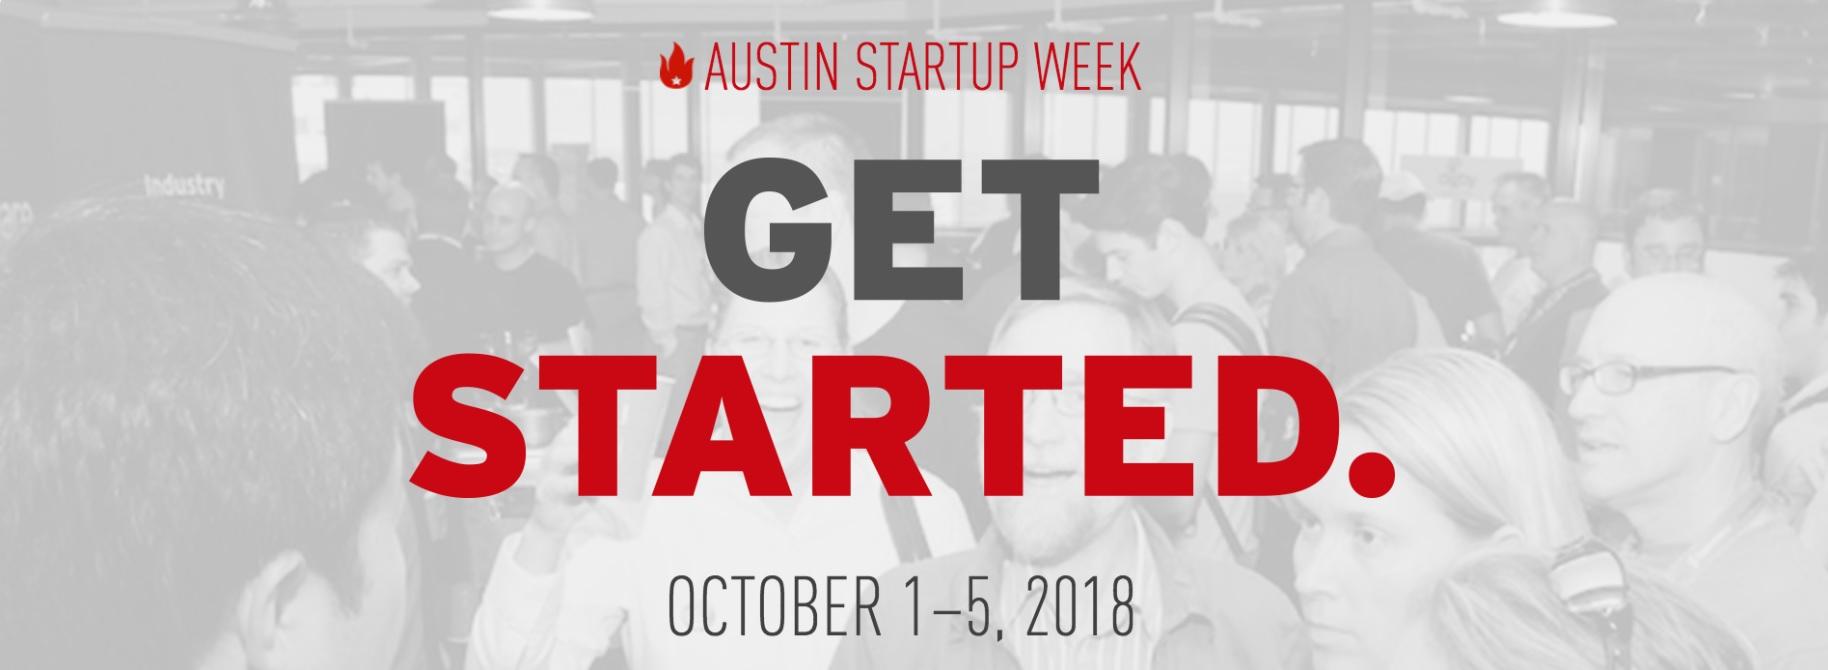 Austin Startup Week 2018 title